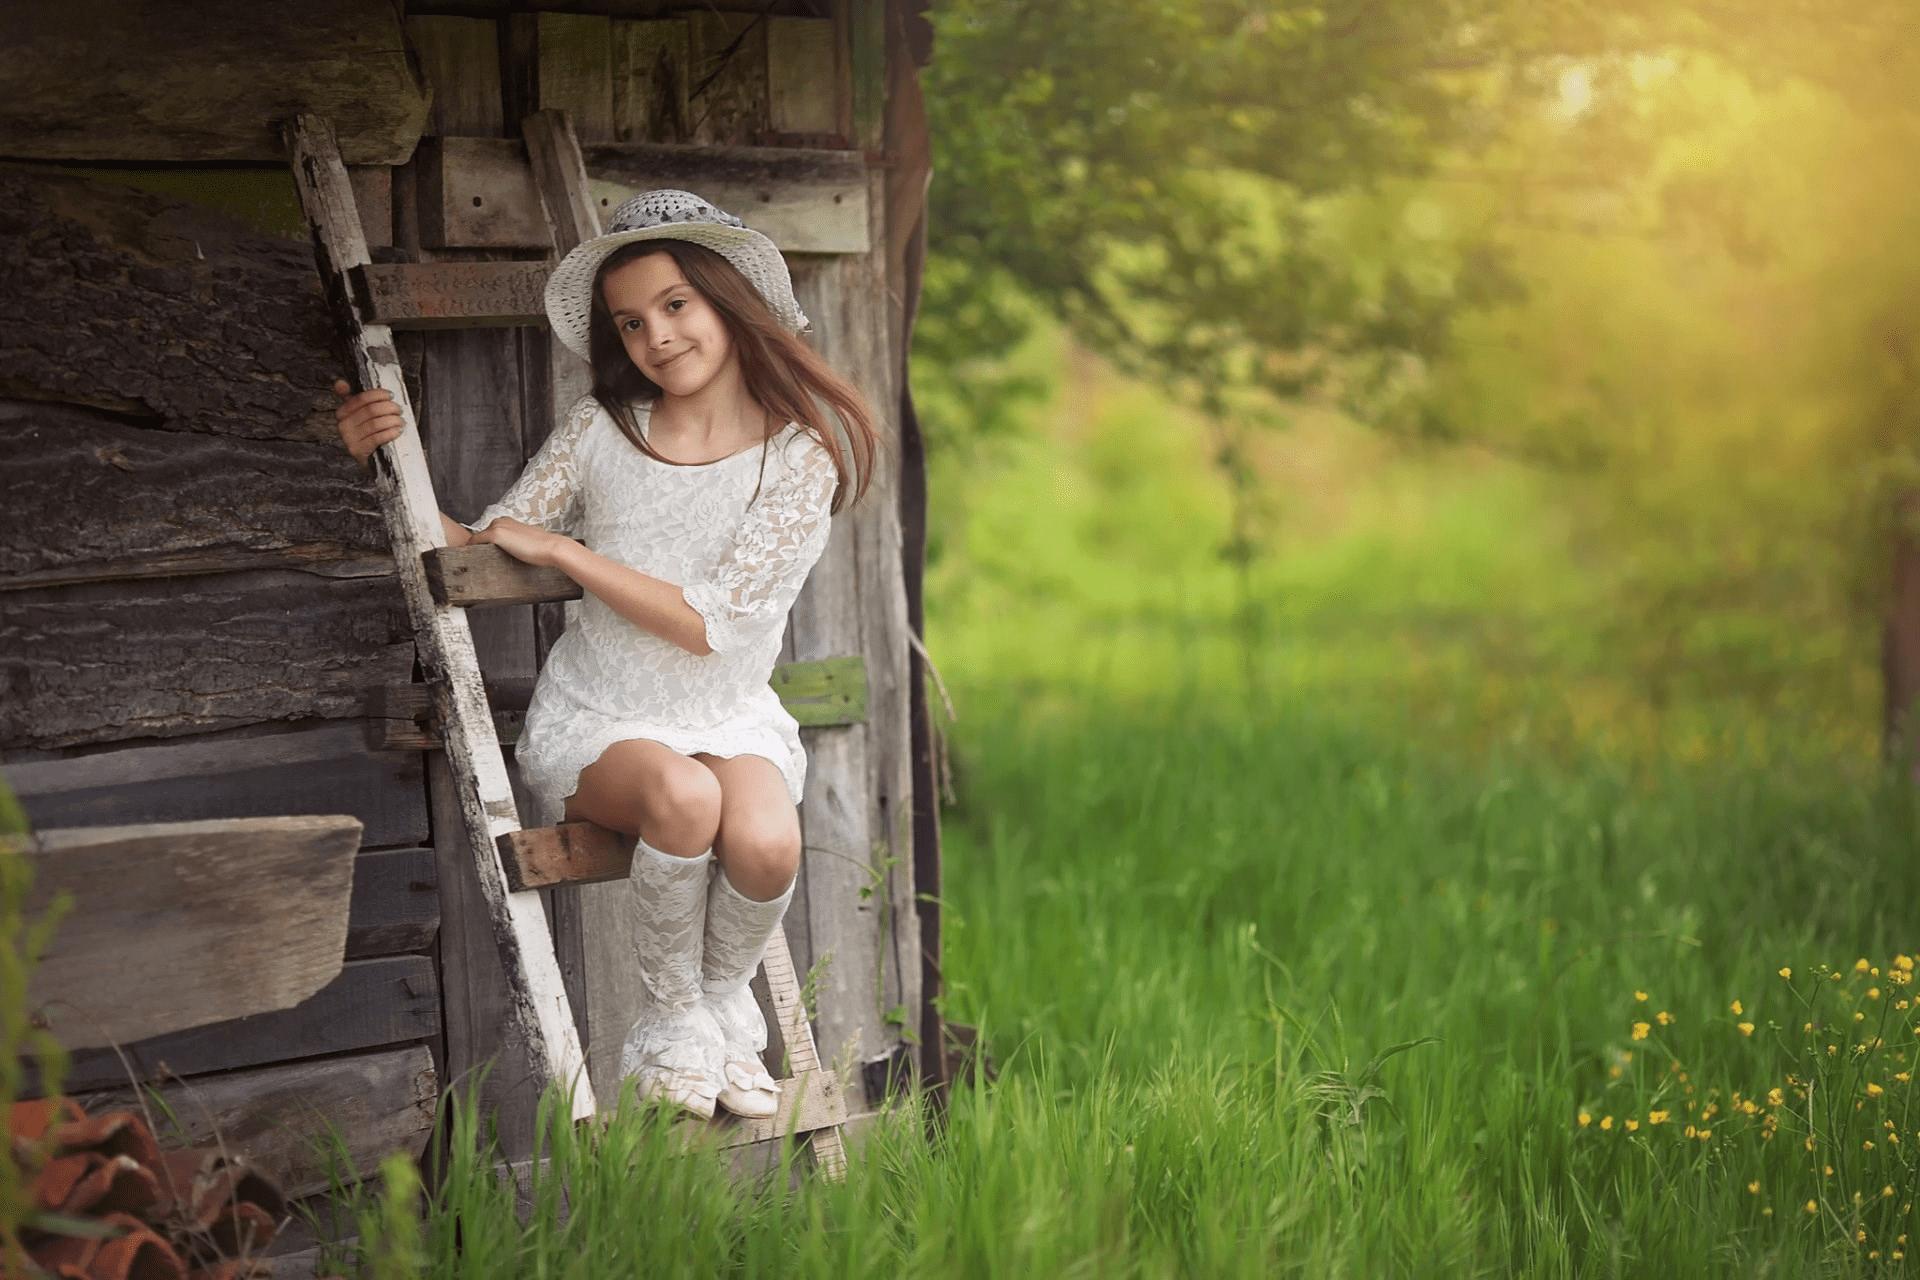 Wallpaper Of Cute Little Baby Girl Country Girl Wallpapers Pixelstalk Net